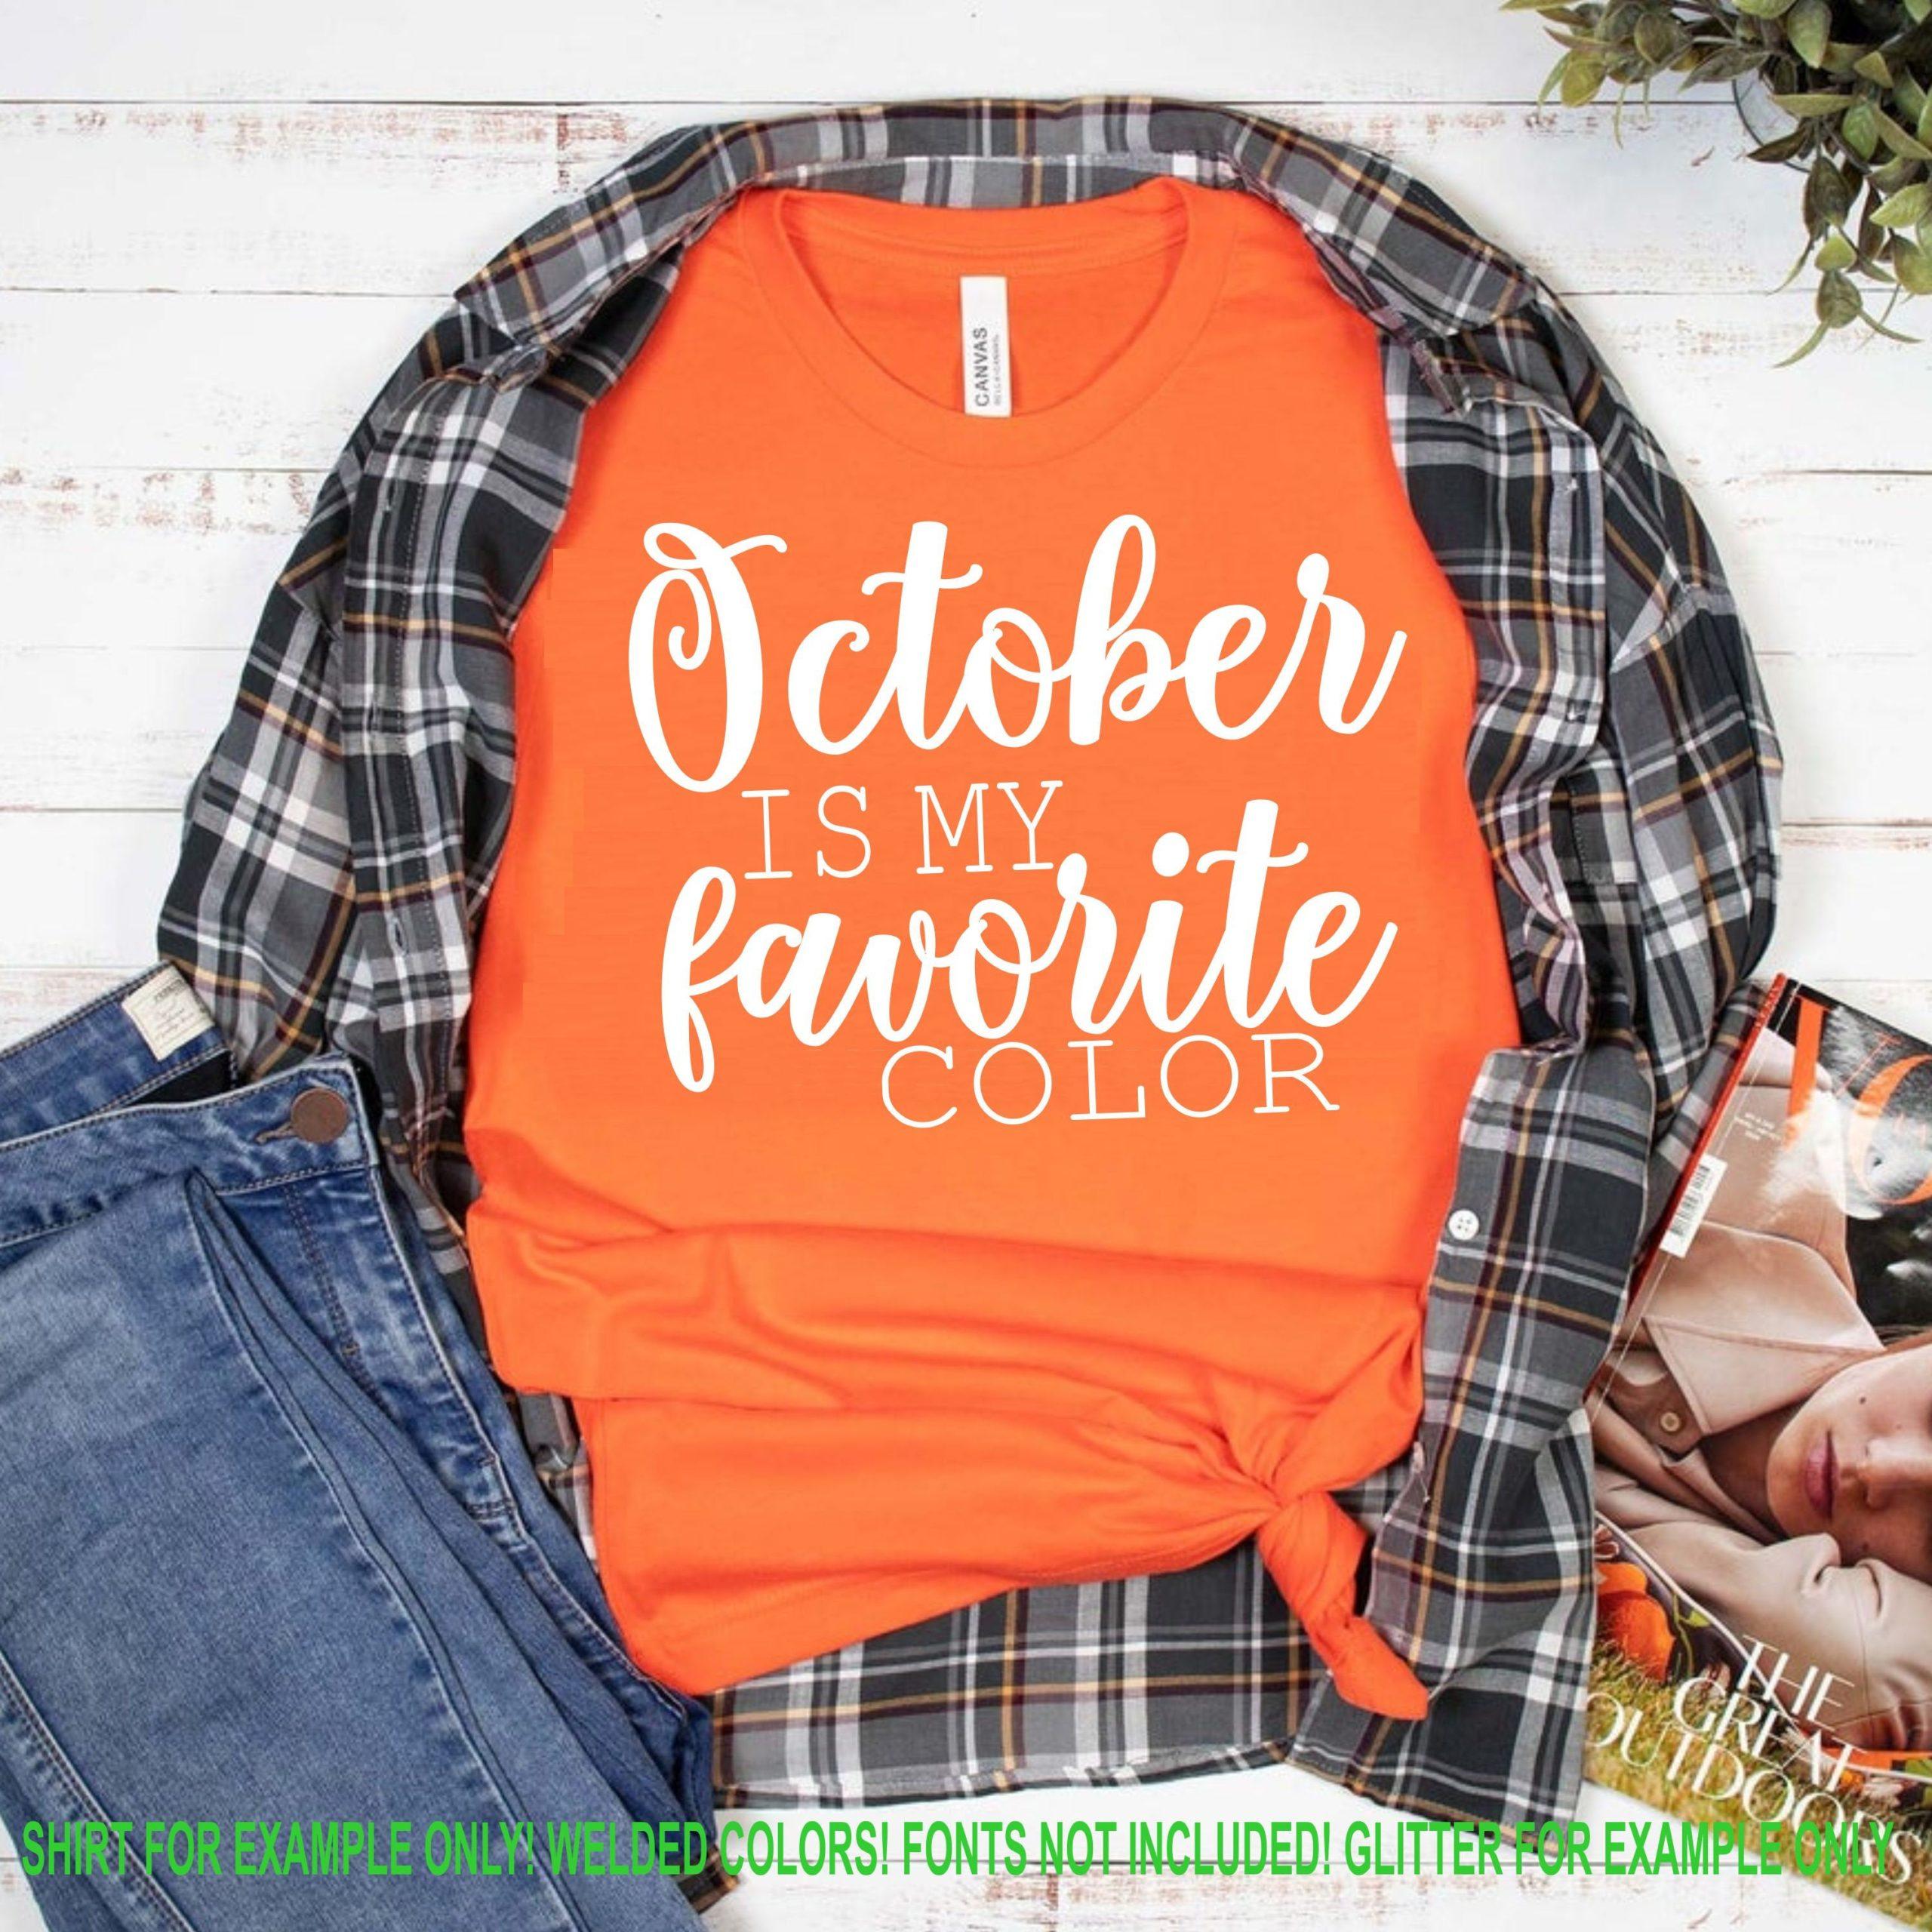 October-is-my-favorite-svg-fall-svg-hello-fall-svg-fall-quote-seasons-fall-saying-fall-svg-designs-fall-cut-files-cricut-cut-files-5f7218ee